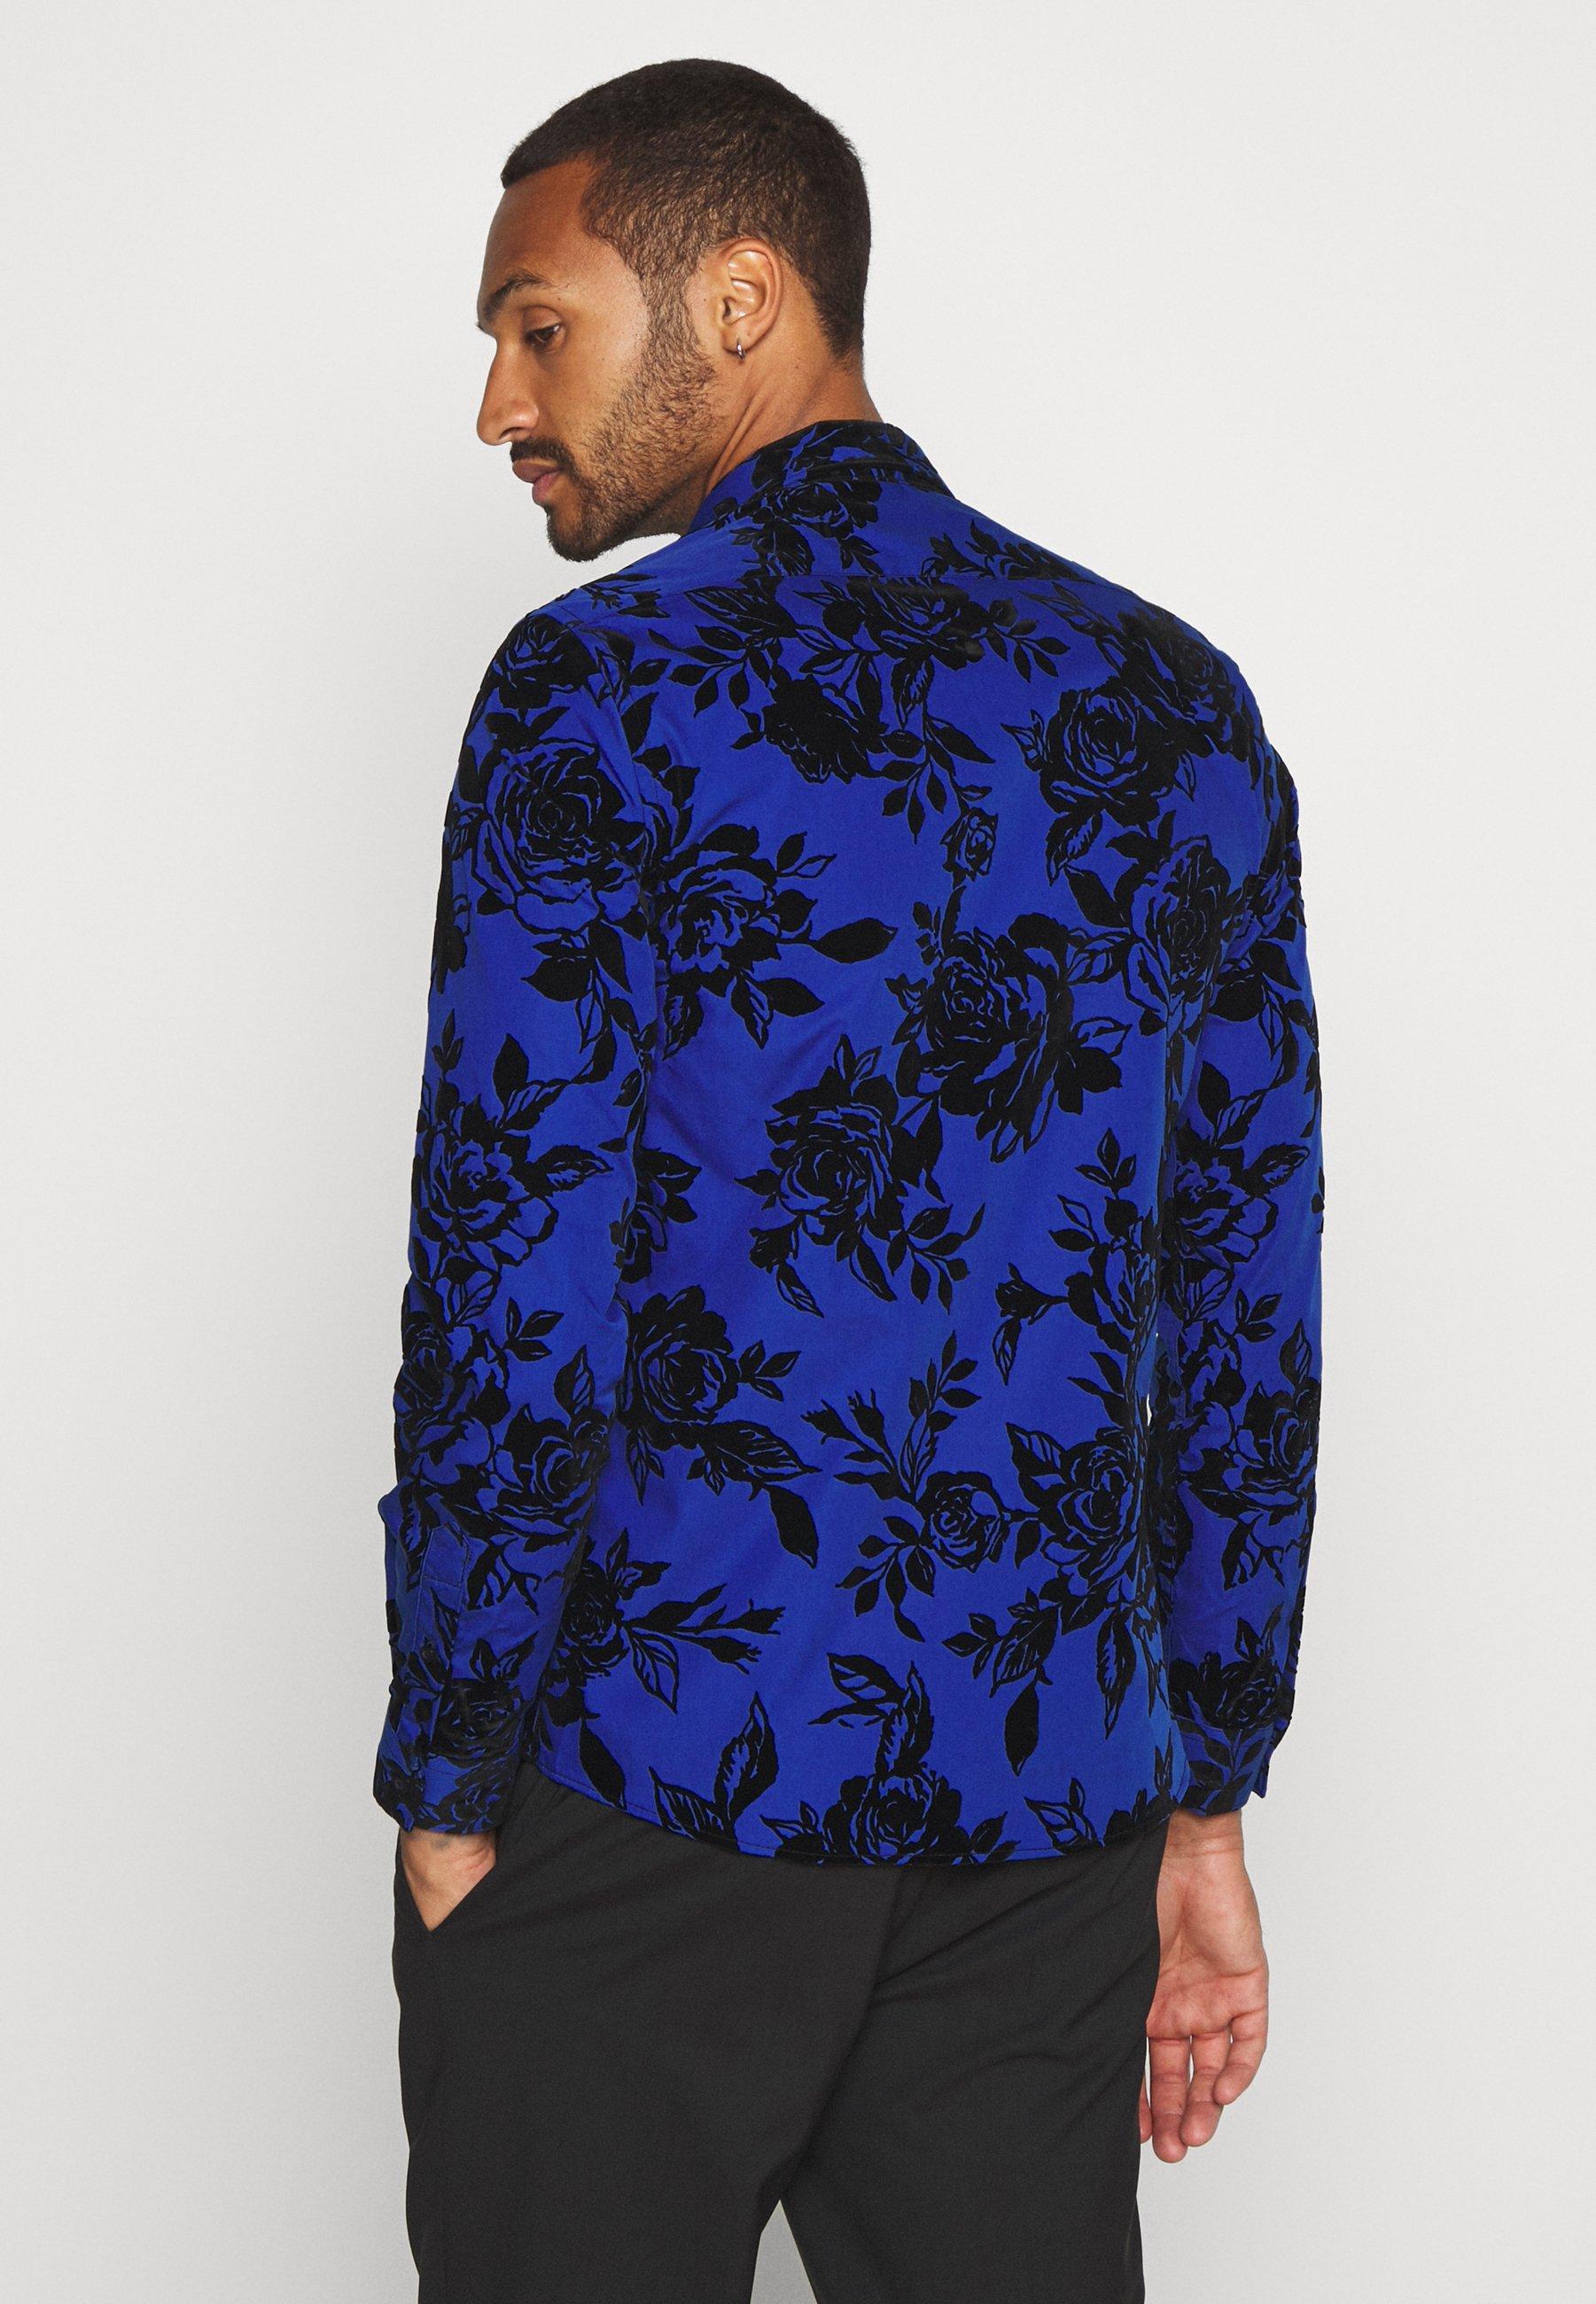 Twisted Tailor MARSHALL SHIRT - Skjorta - blue - Herrkläder Rabatter